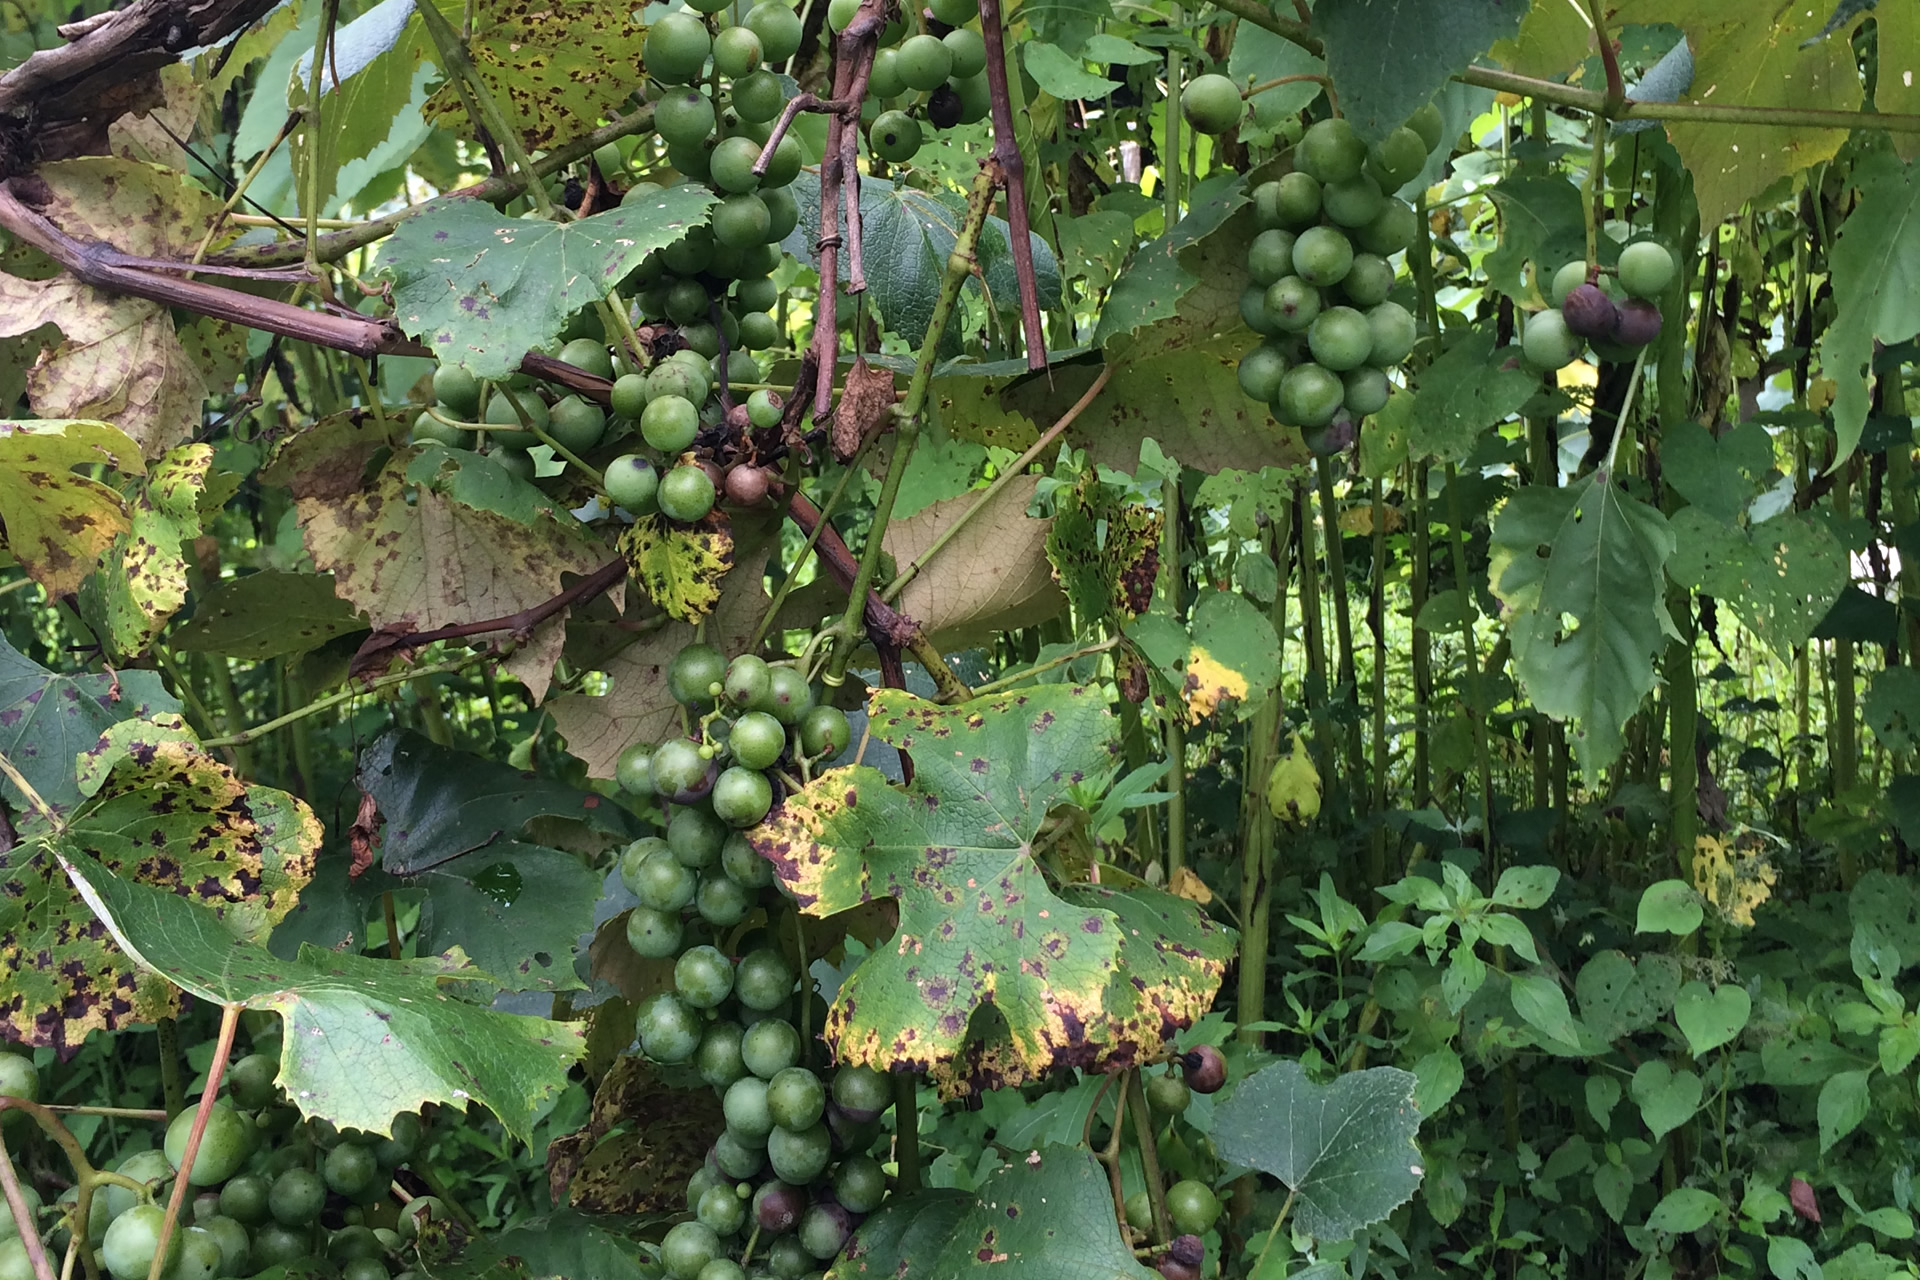 Grapes Hickory Nut Forest North Carolina